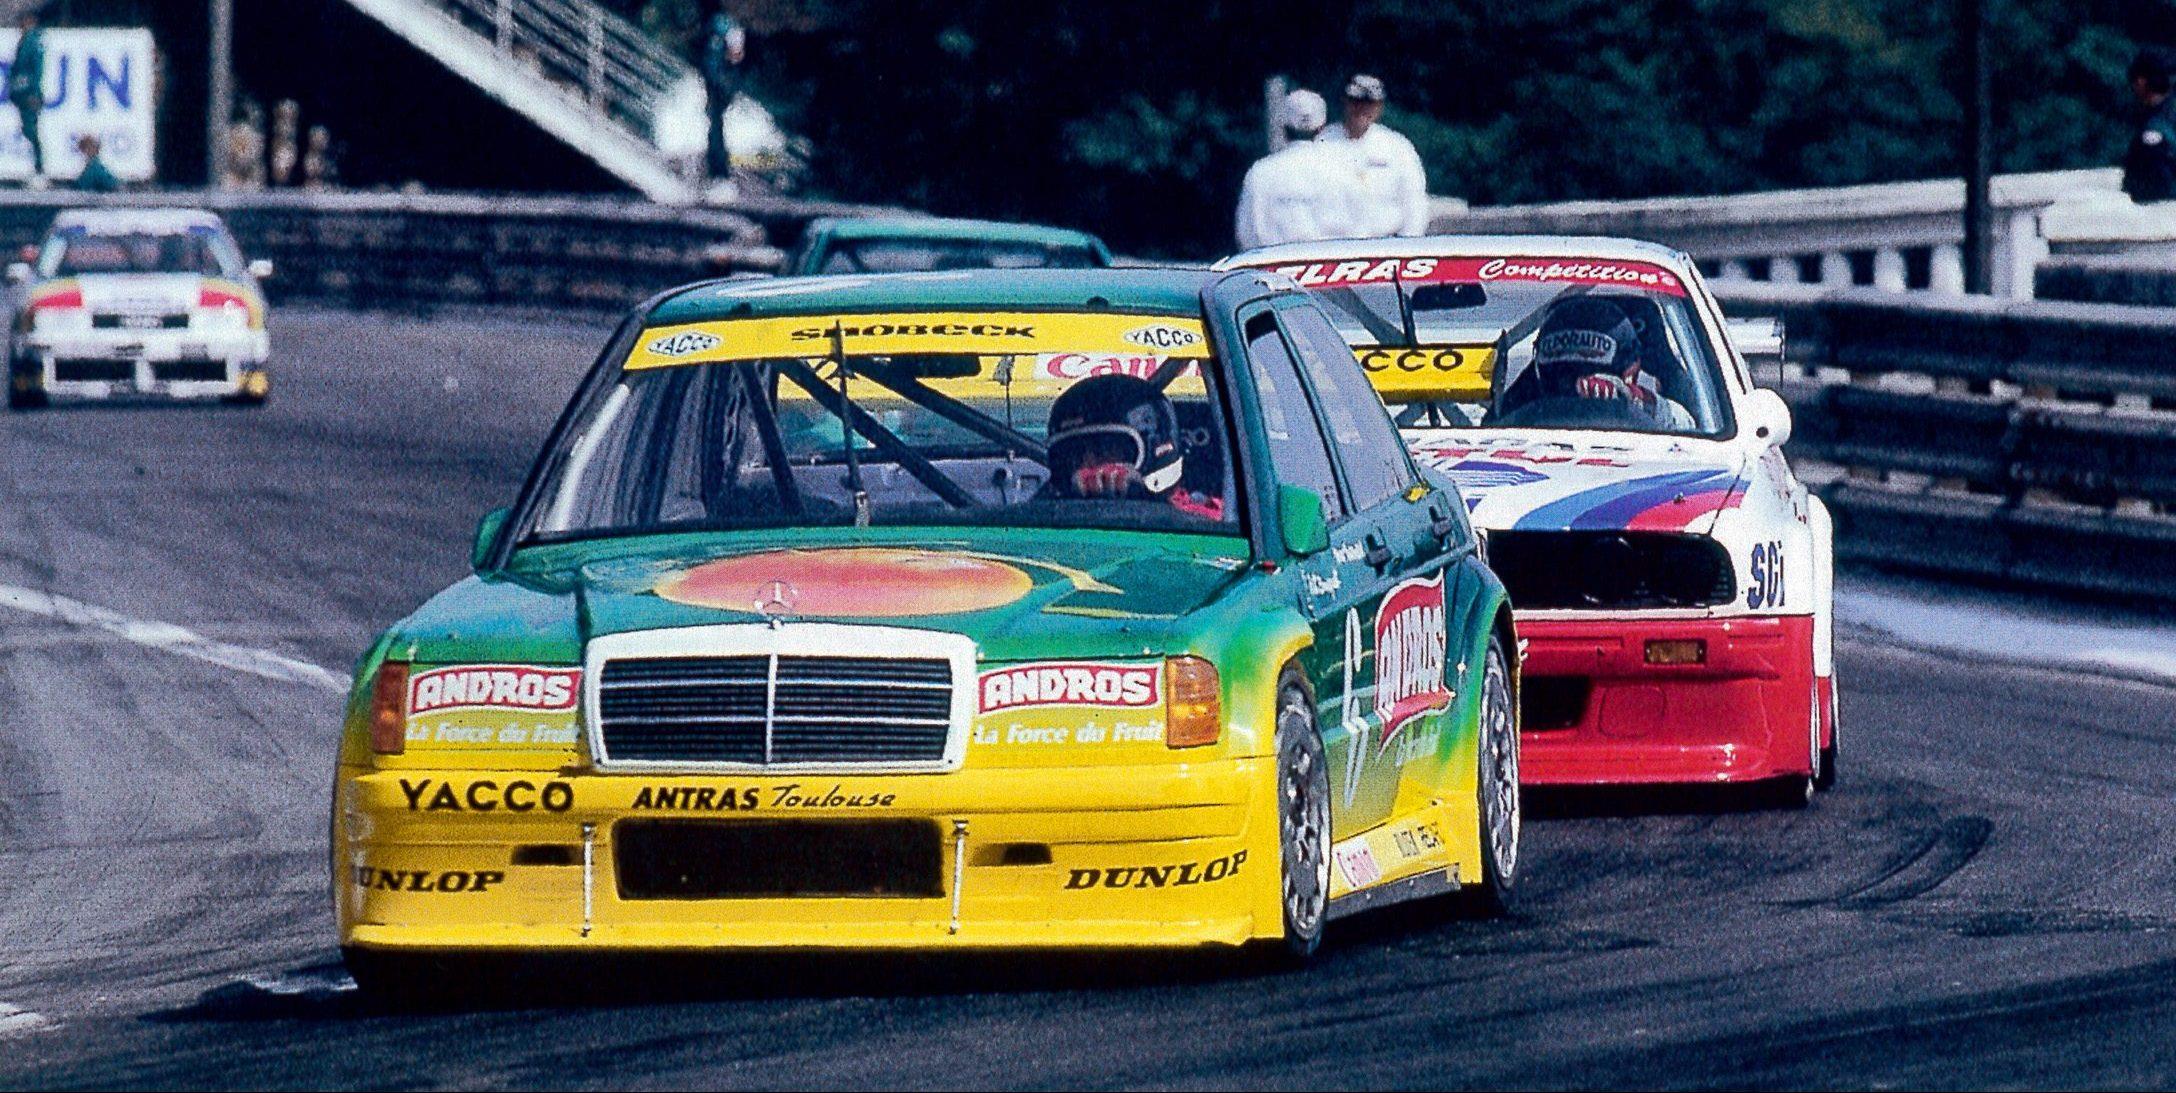 1991 - Mercedes 190 - Supertourisme